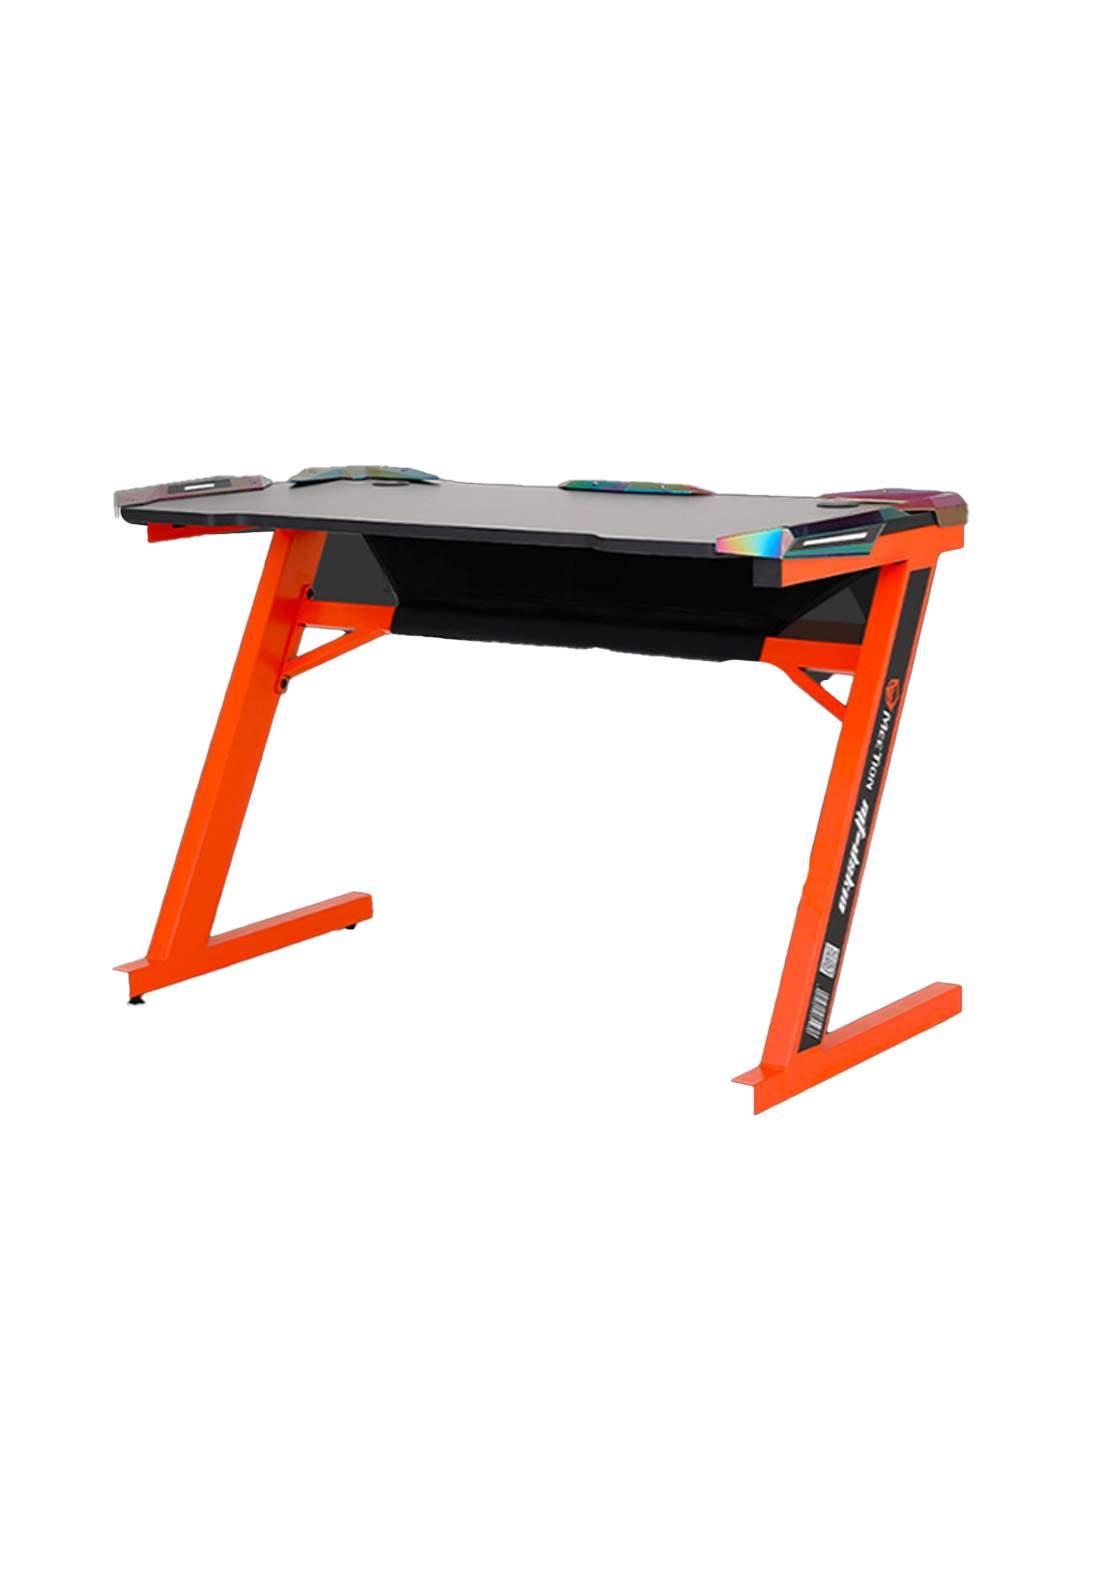 Meetion DSK10 Z Shaped Gaming E-Sport Desk - Orange منضدة لابتوب